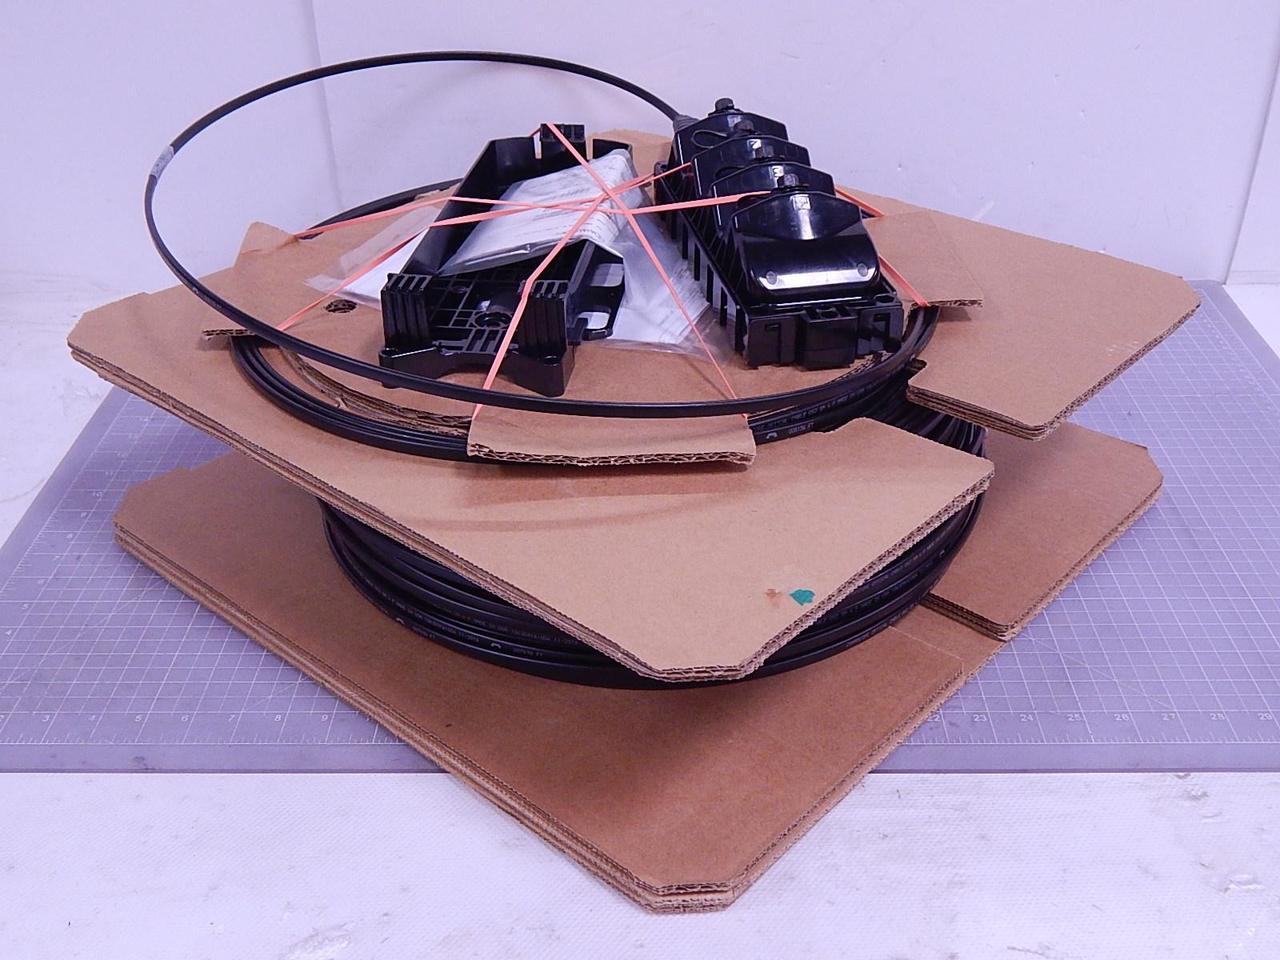 Commscope MST-04XX00-A0500U Mini-MST Fiber Optic Multiport Service Terminal  4-port Fiber Optic Cable Roll OS2 Single Mode 500 FT T116736